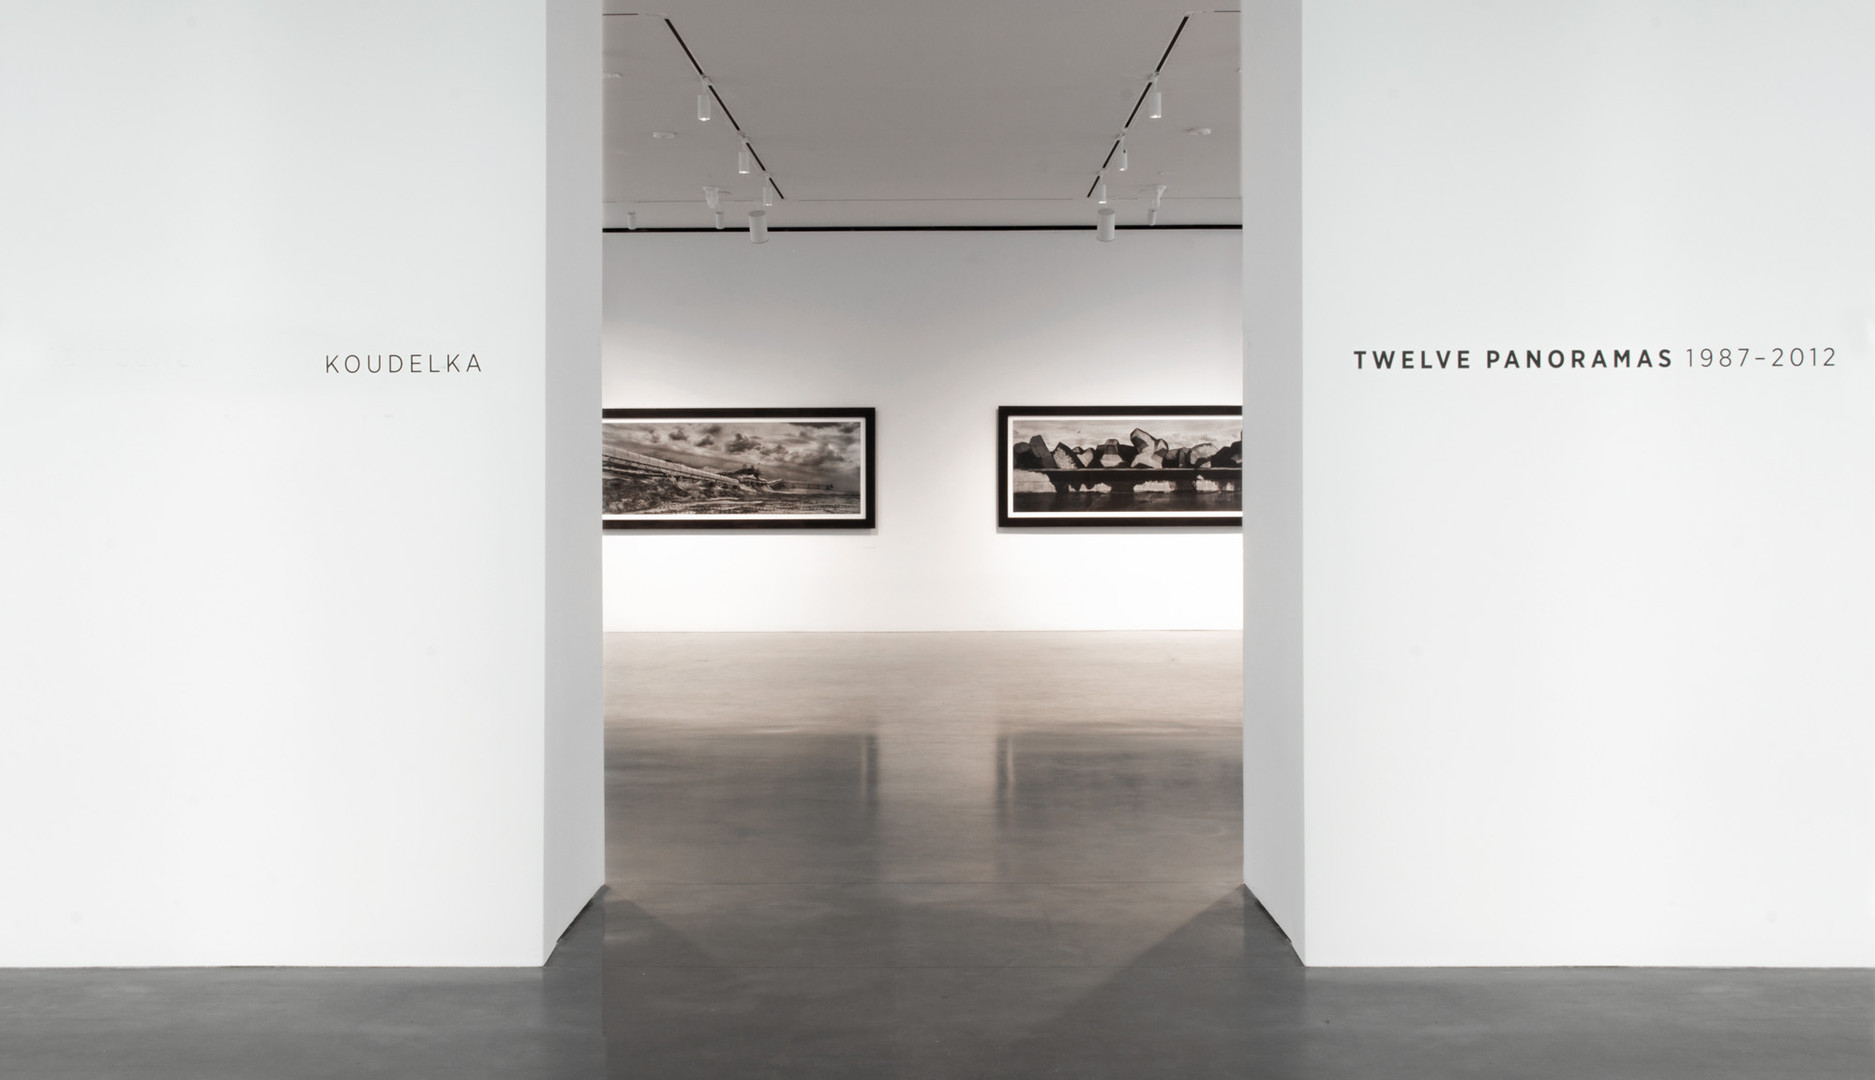 Josef Koudelka: Twelve Panoramas 1987-2012